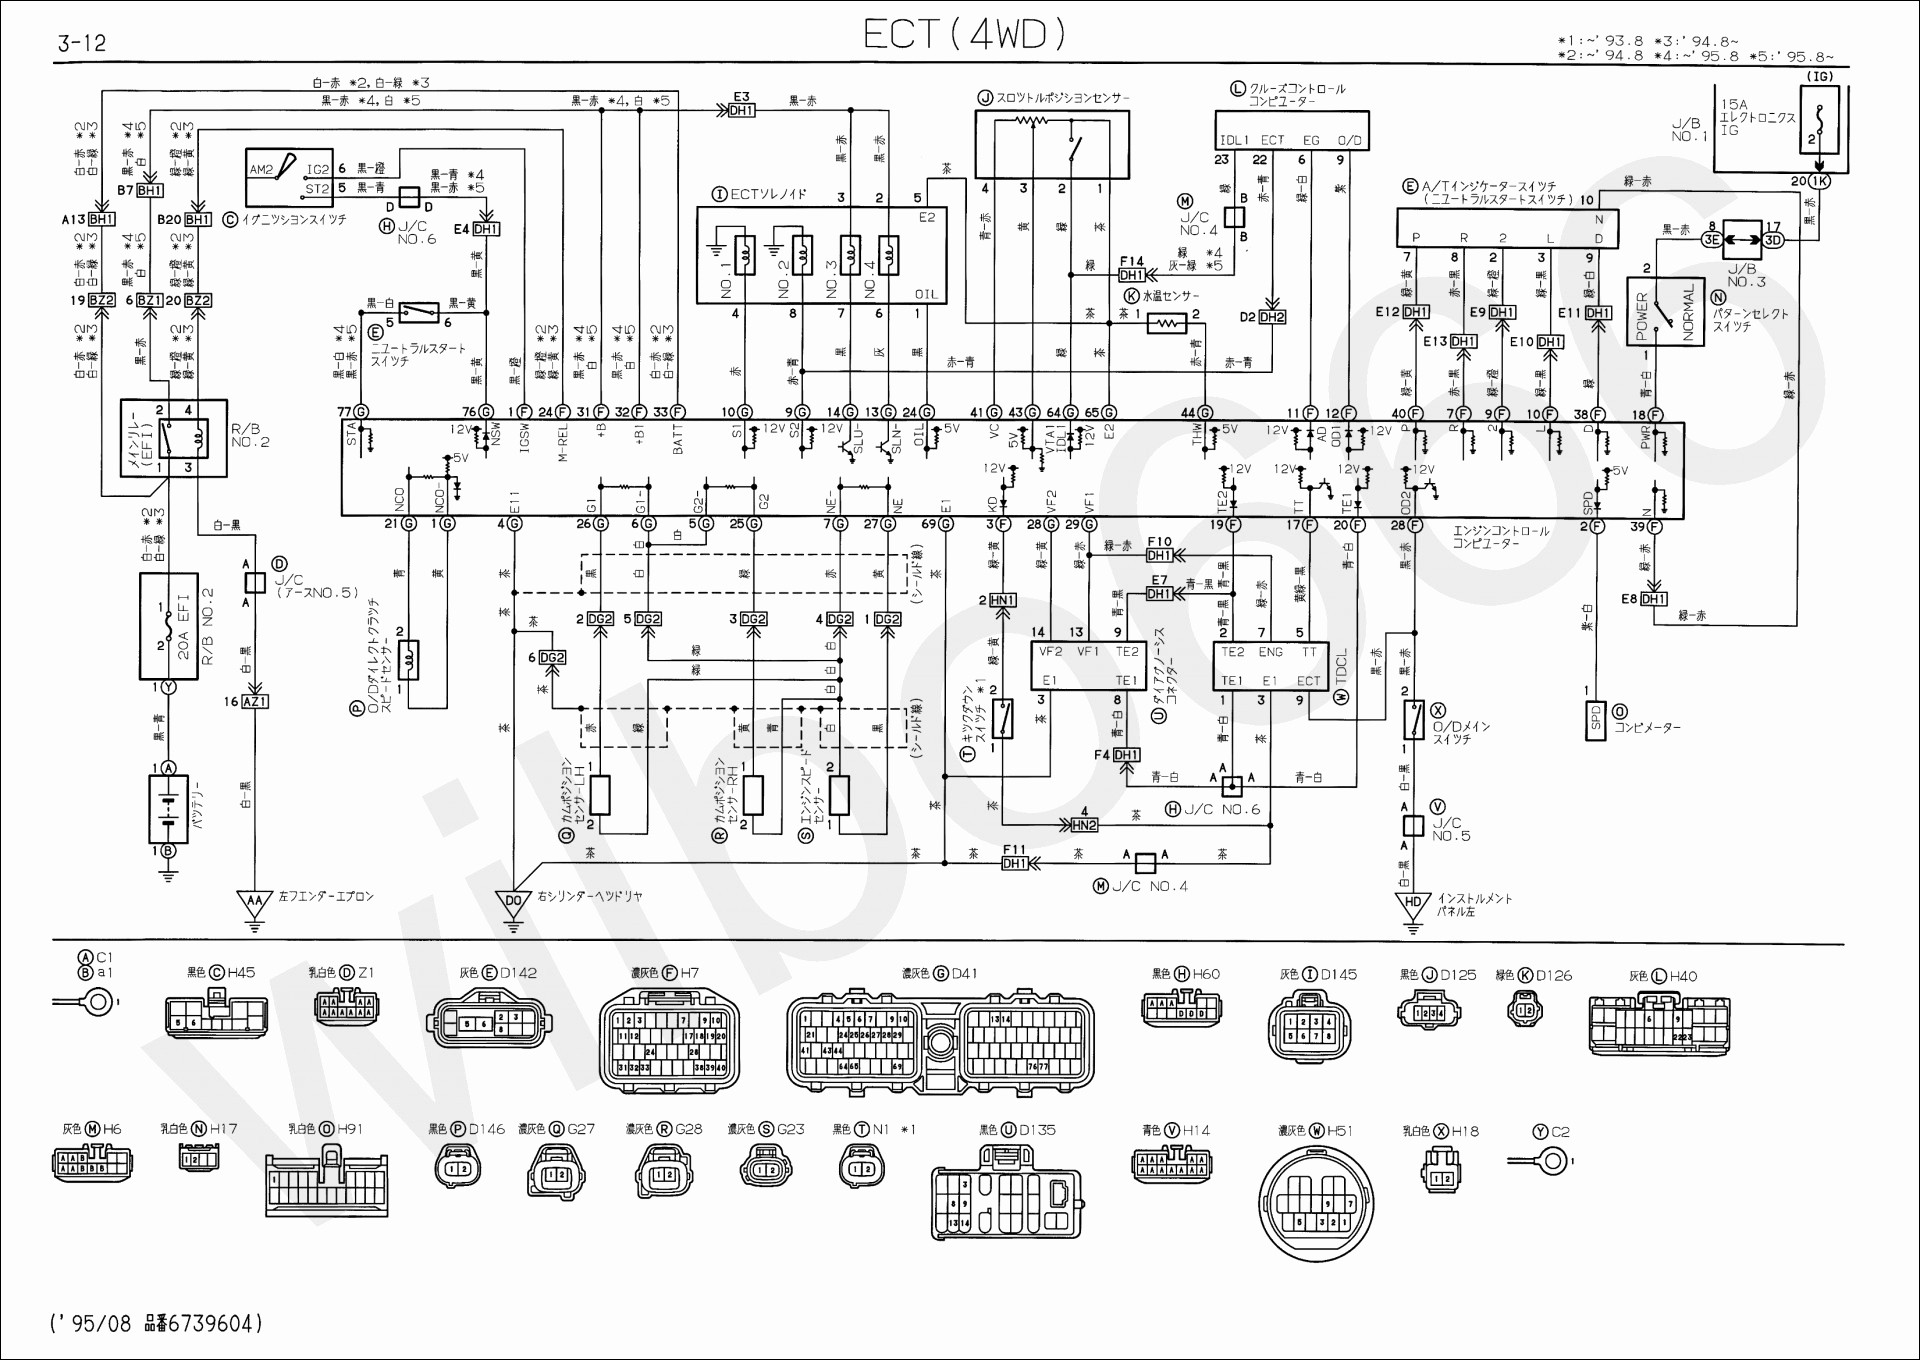 Alternator Parts Diagram Alternator Wiring Diagram Image Of Alternator Parts Diagram Alternator Wiring Diagram Image